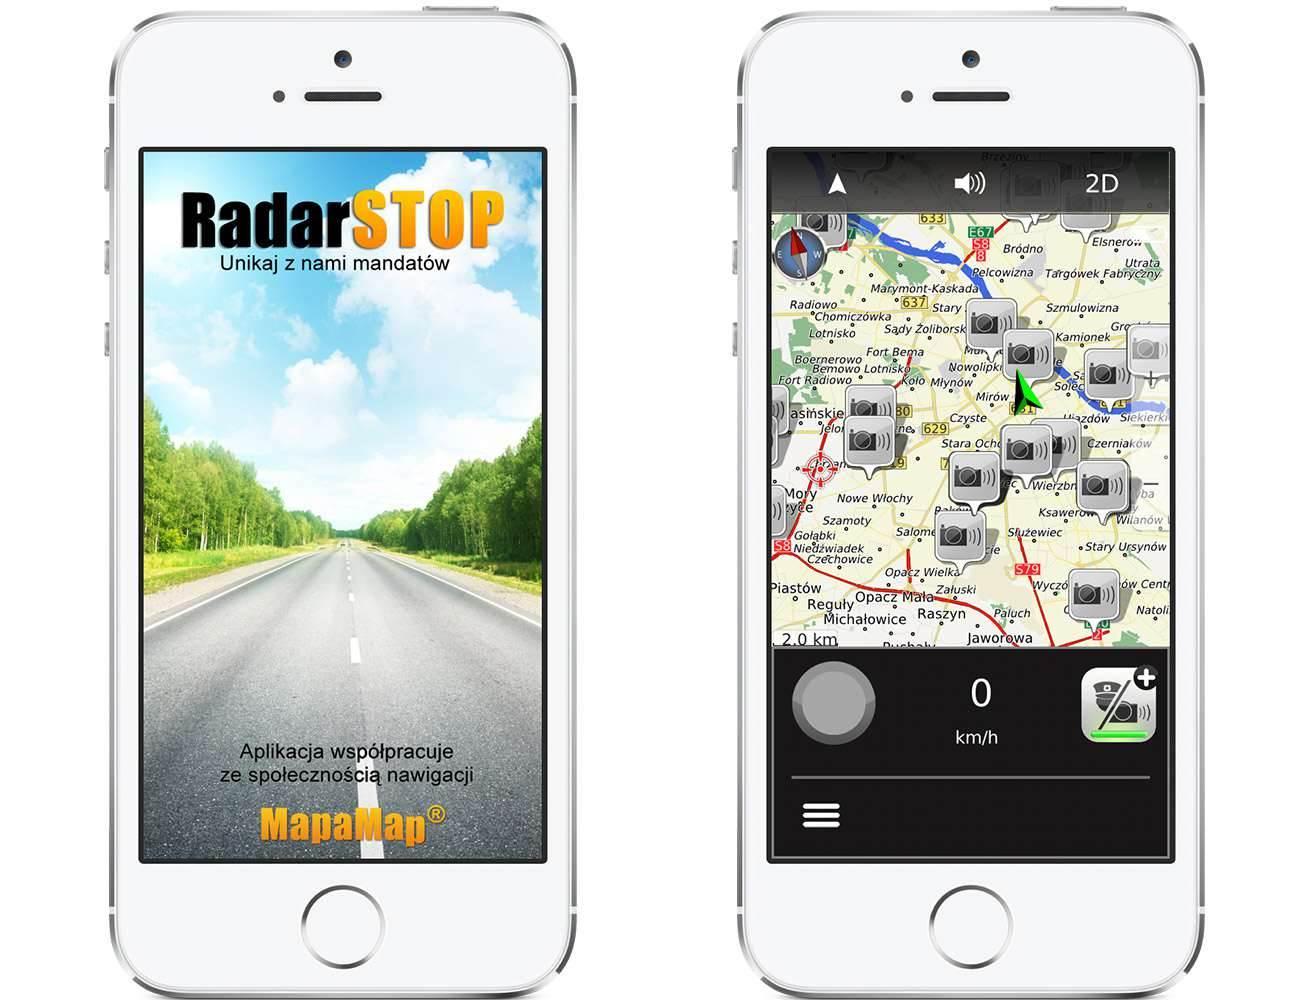 RadarStop.onetech.pl